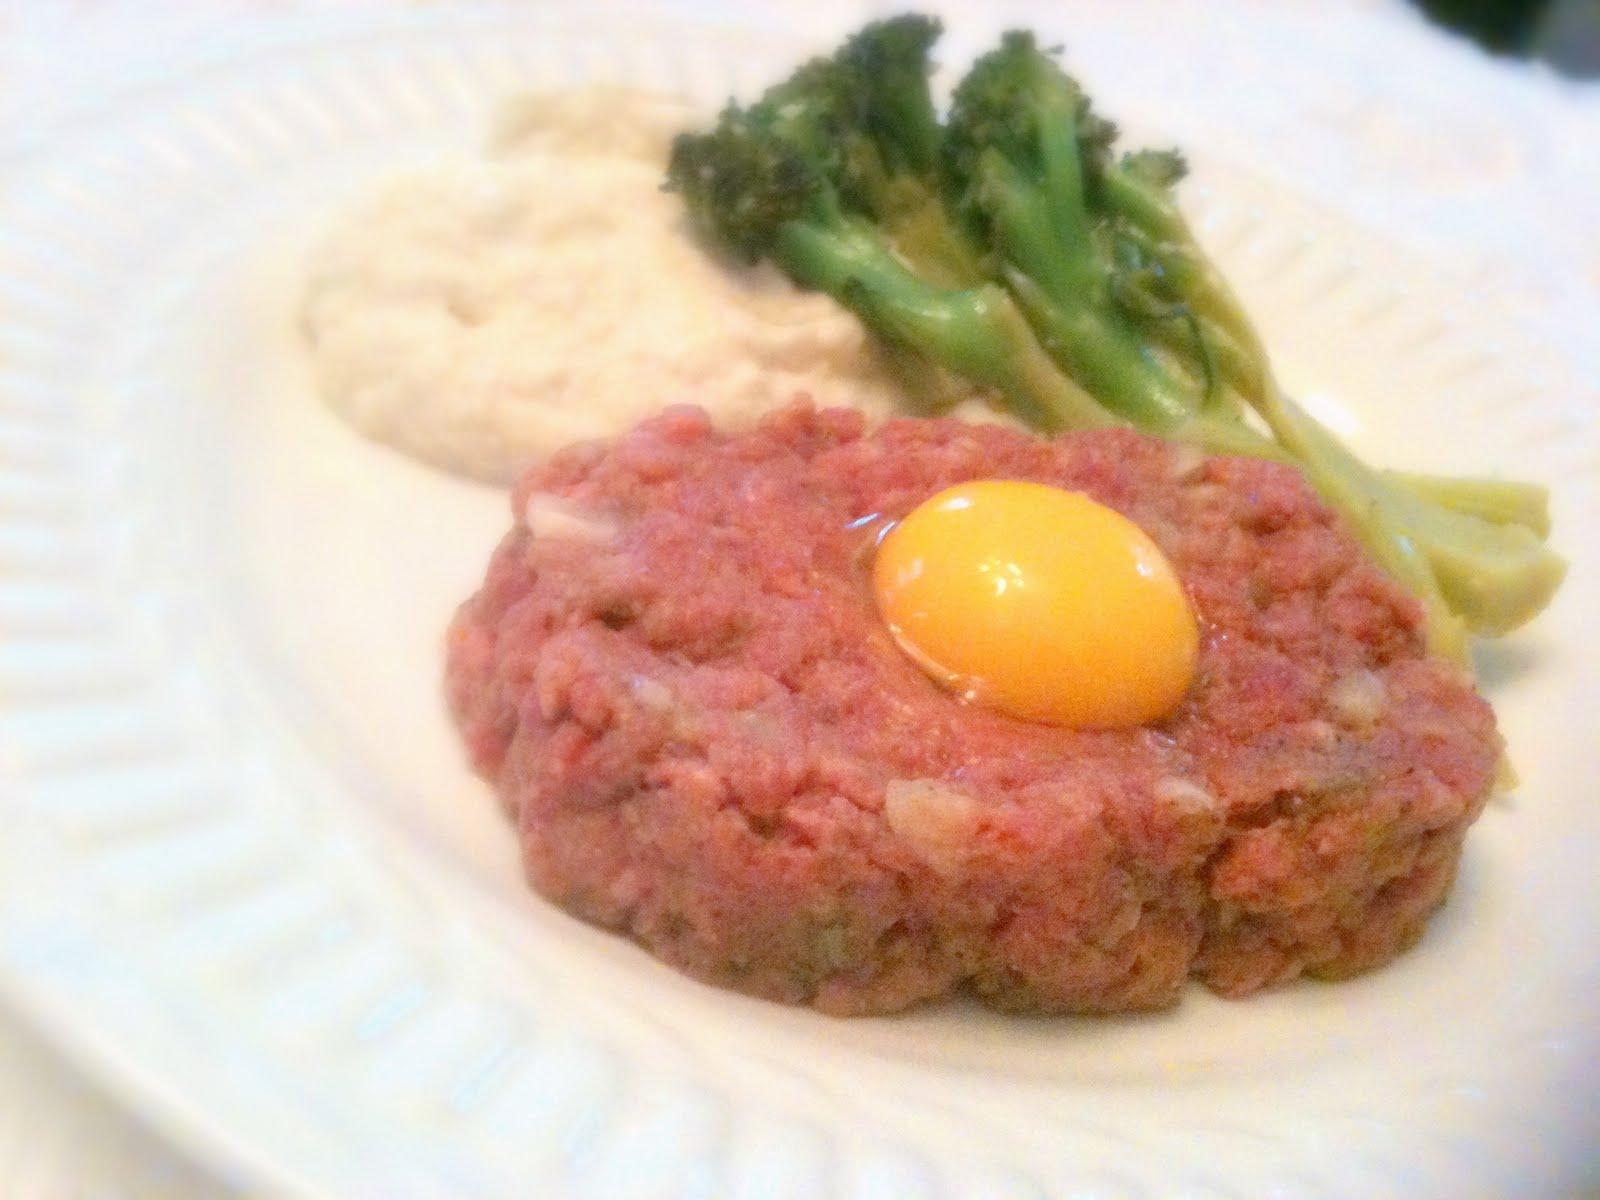 steak tartare, mashed cauliflower, lemon-garlic broccoli